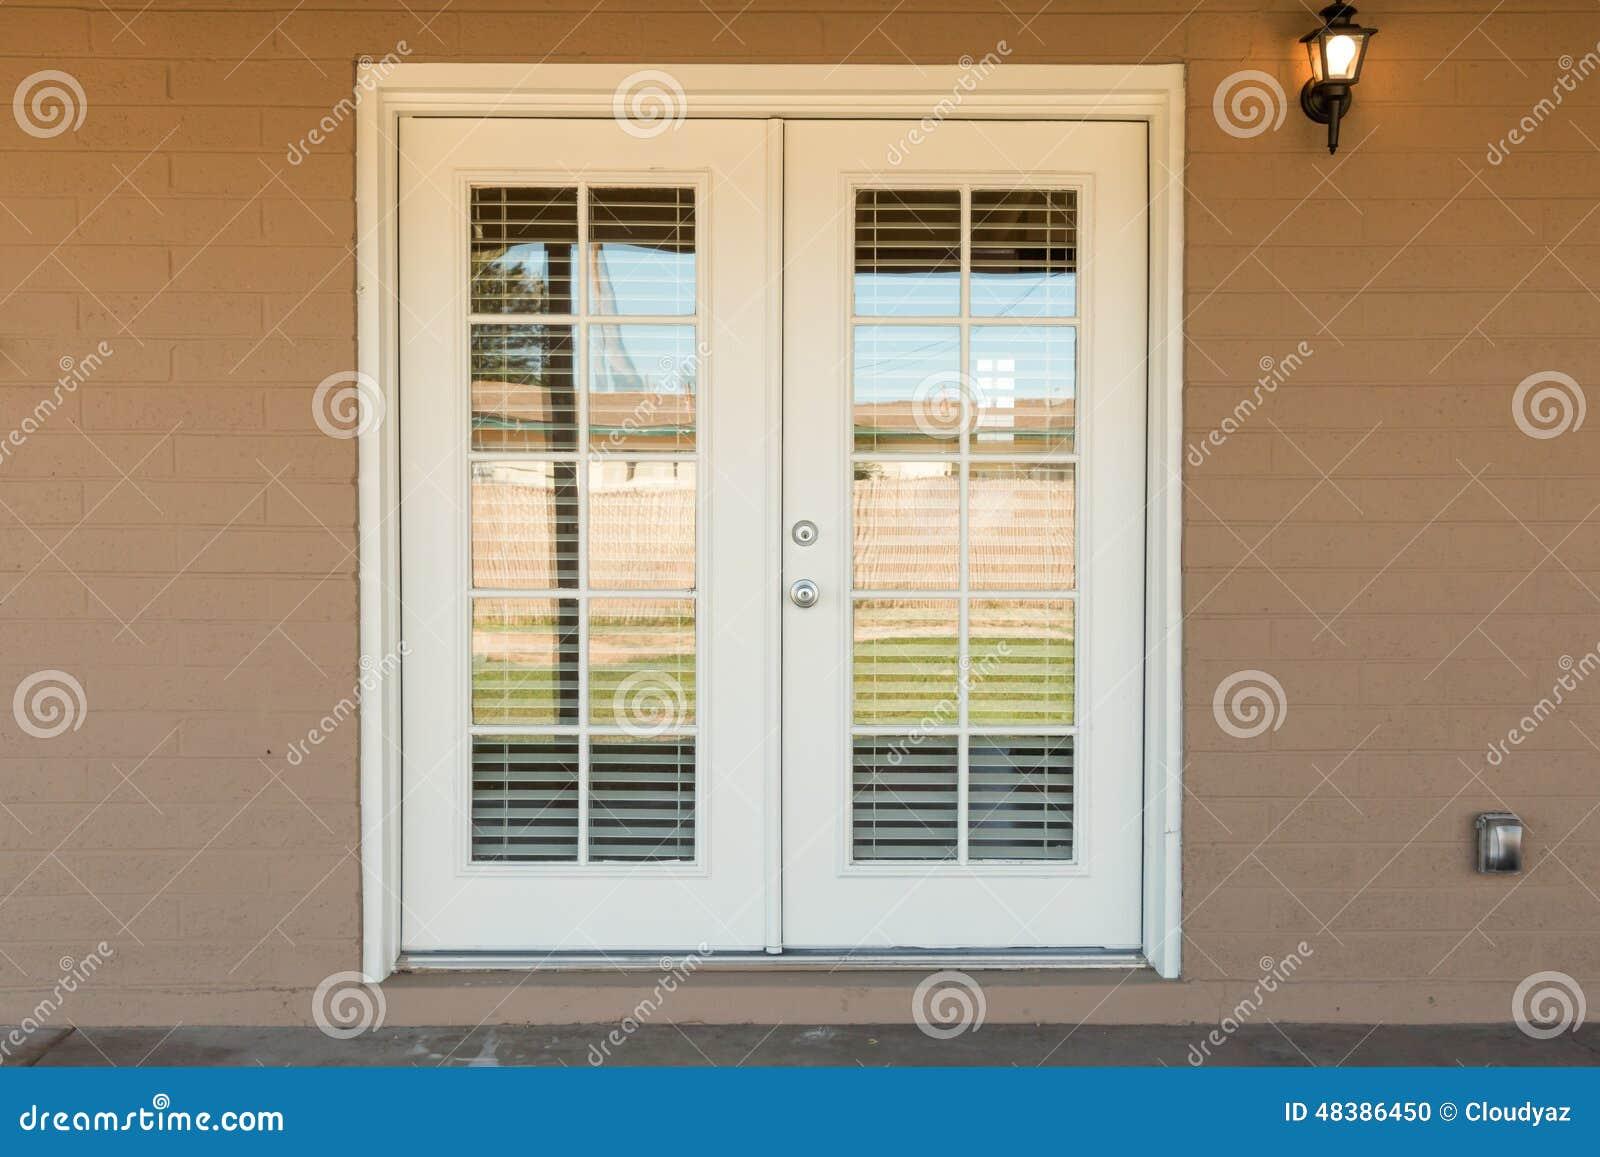 Exterior Glass Door Stock Photo Image Of Glass Light 48386450